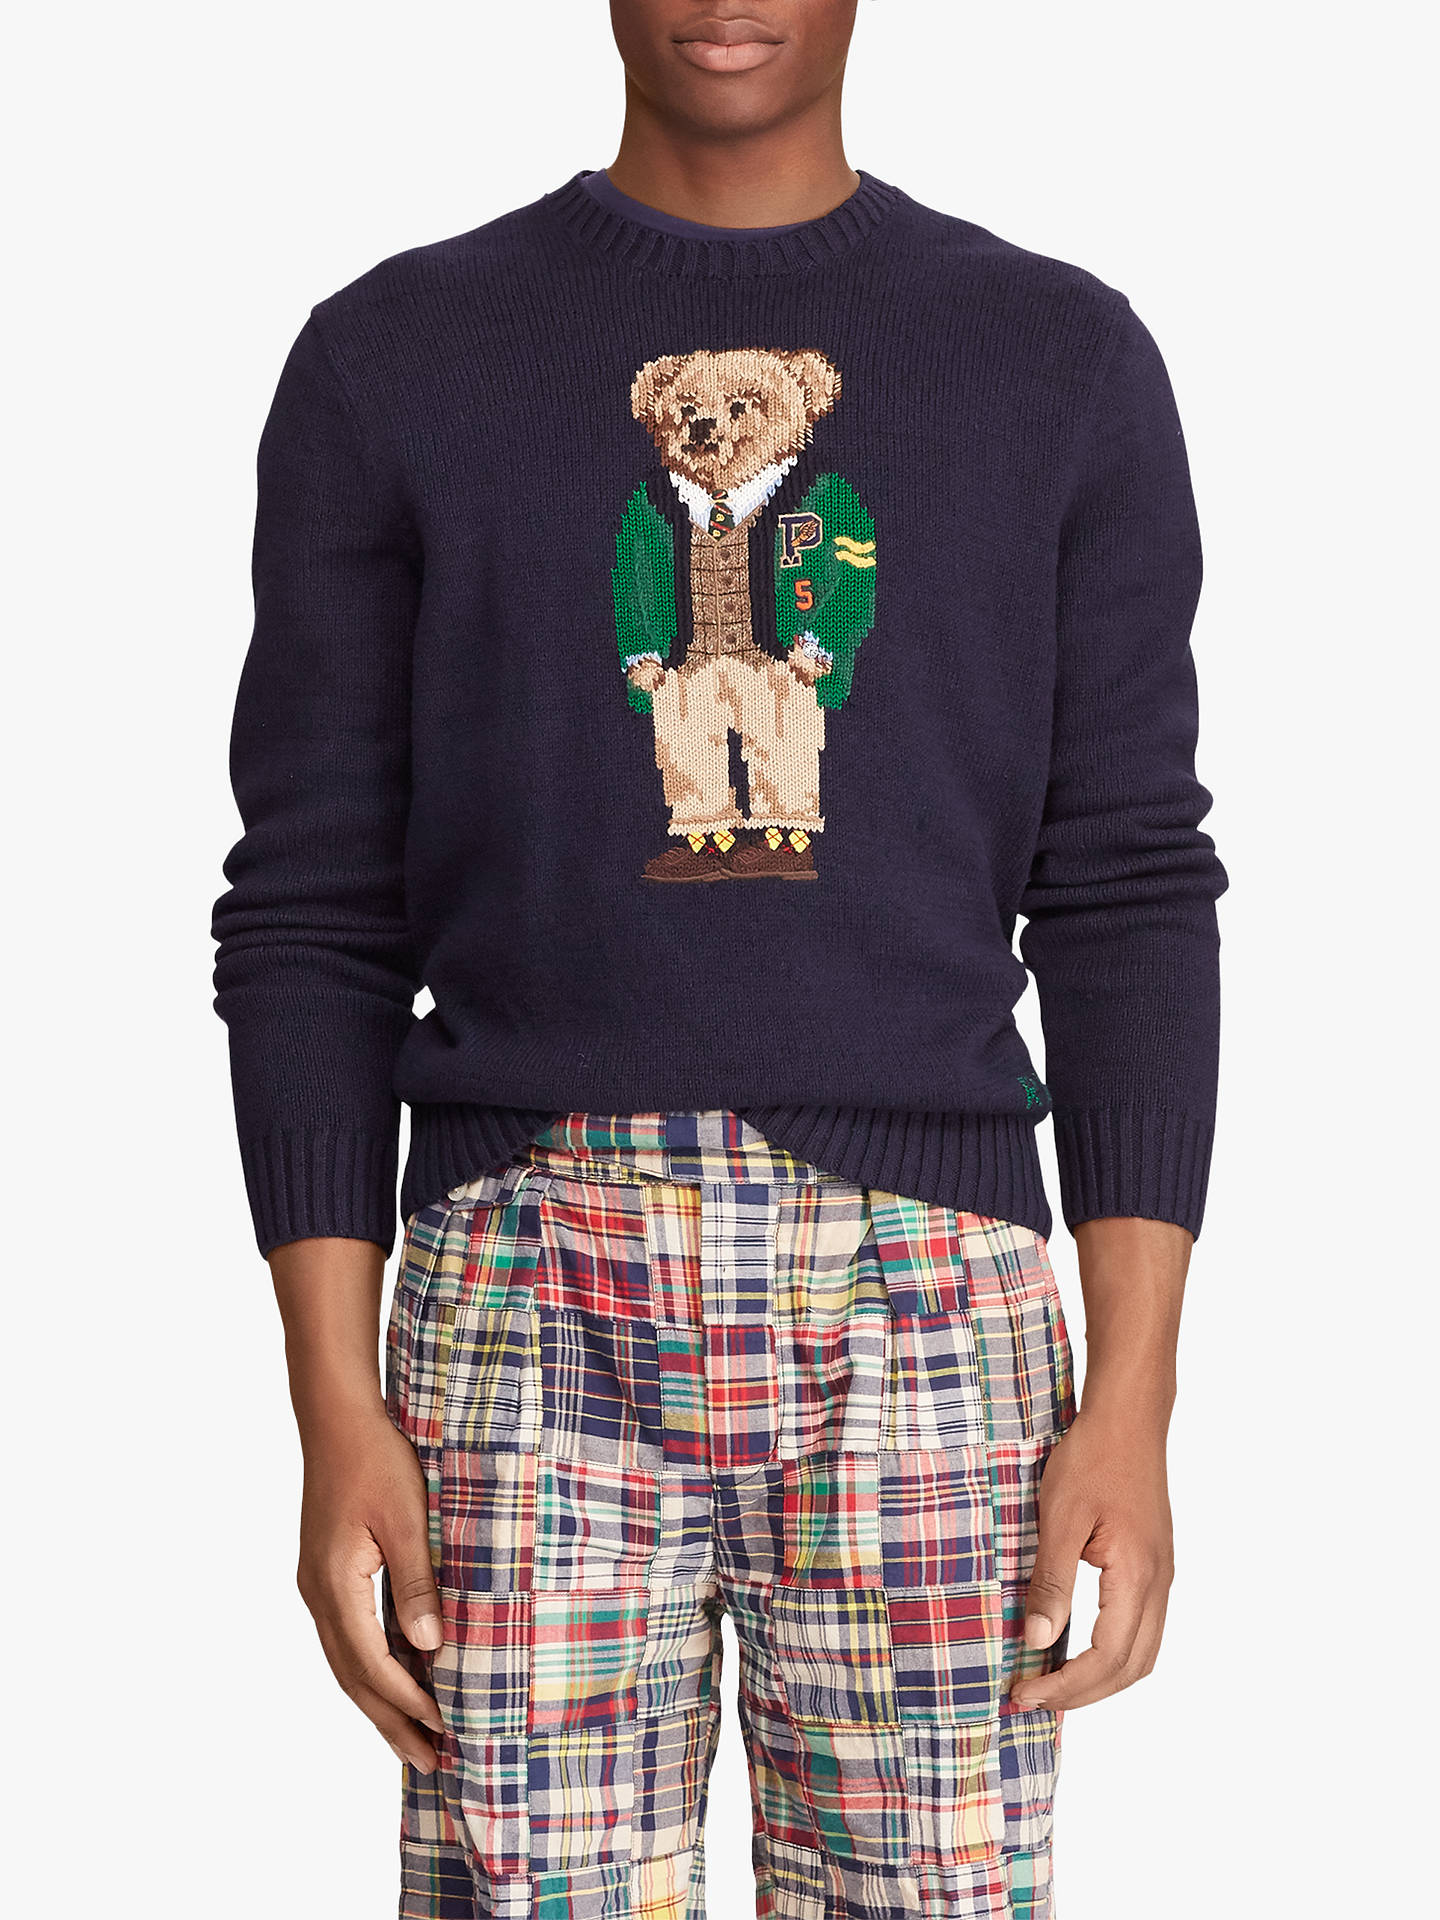 5ba224b4c68 Buy Polo Ralph Lauren University Bear Sweater